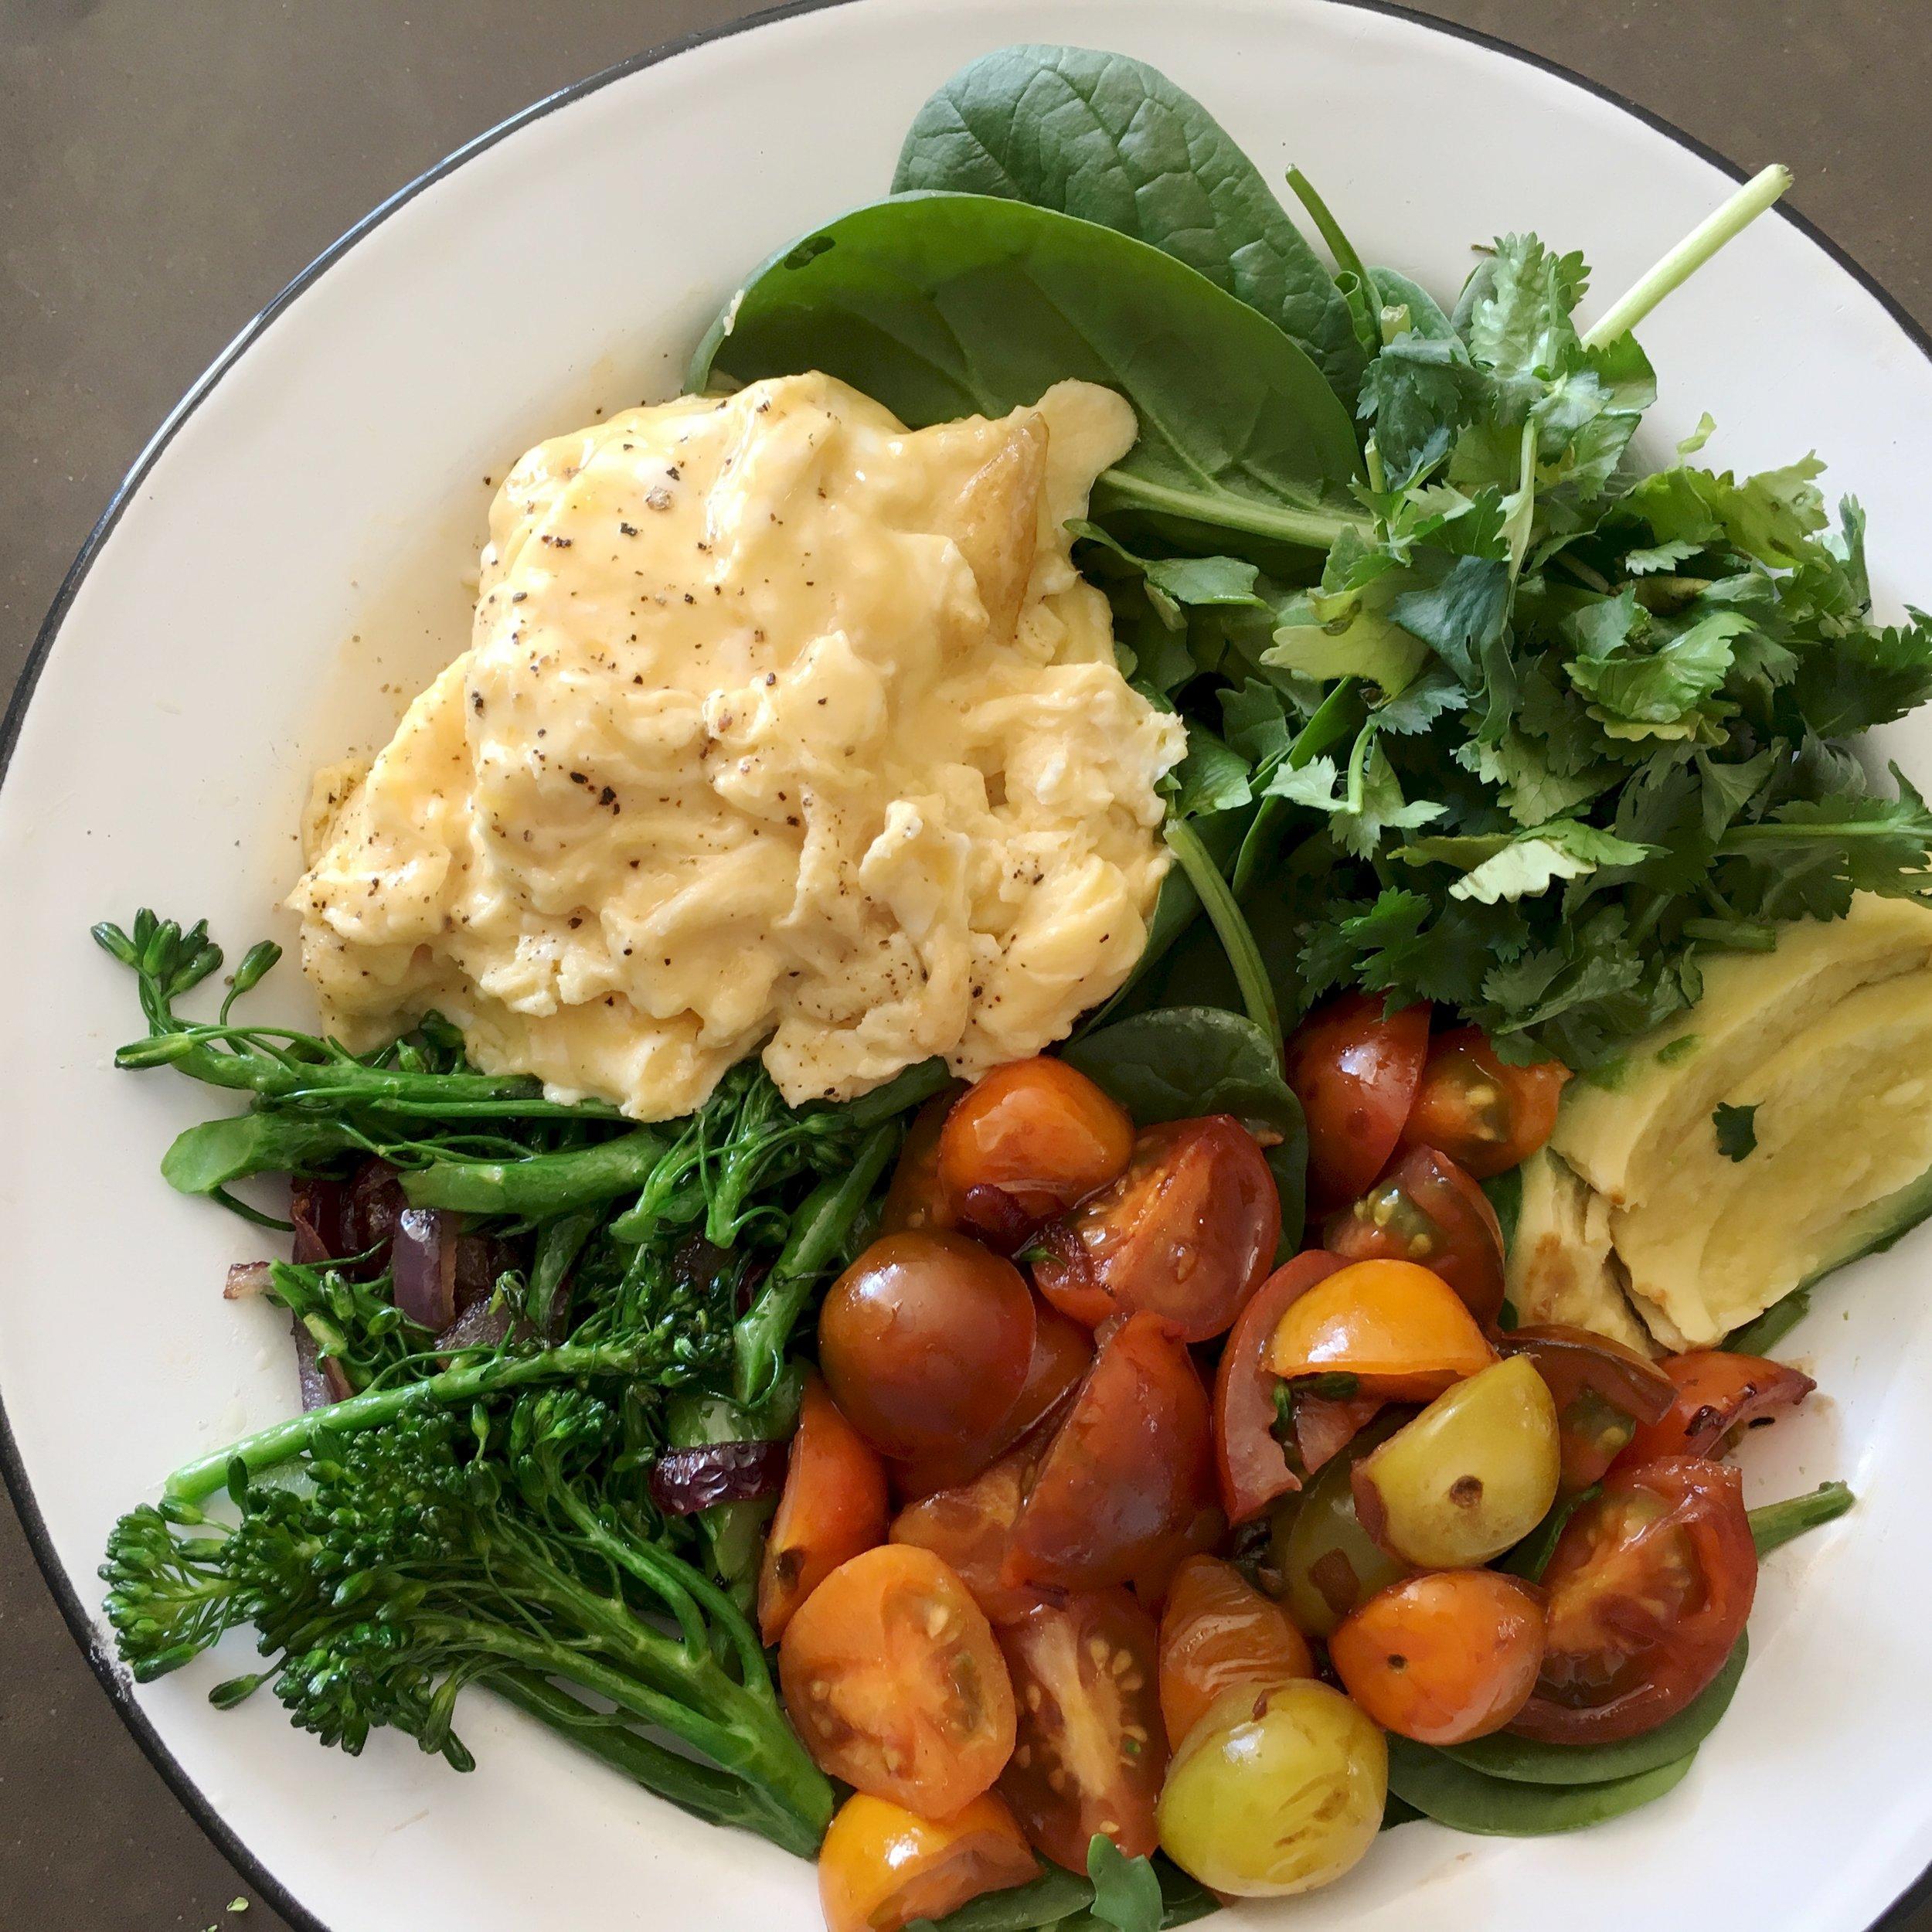 Healthy breakfast option paleo